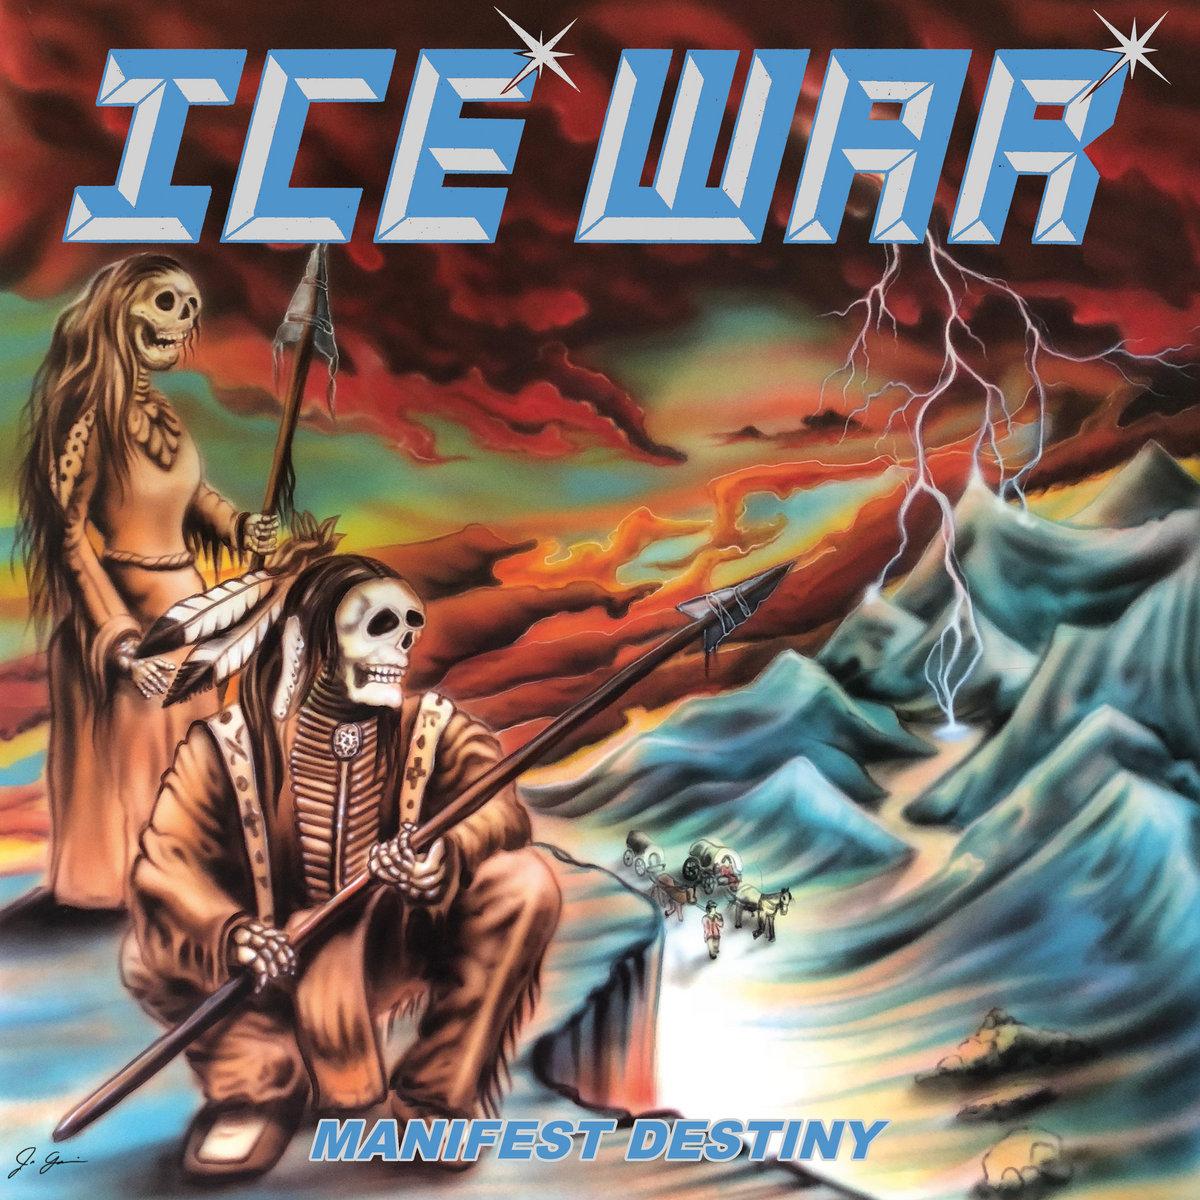 Ice War - Manifest Destiny